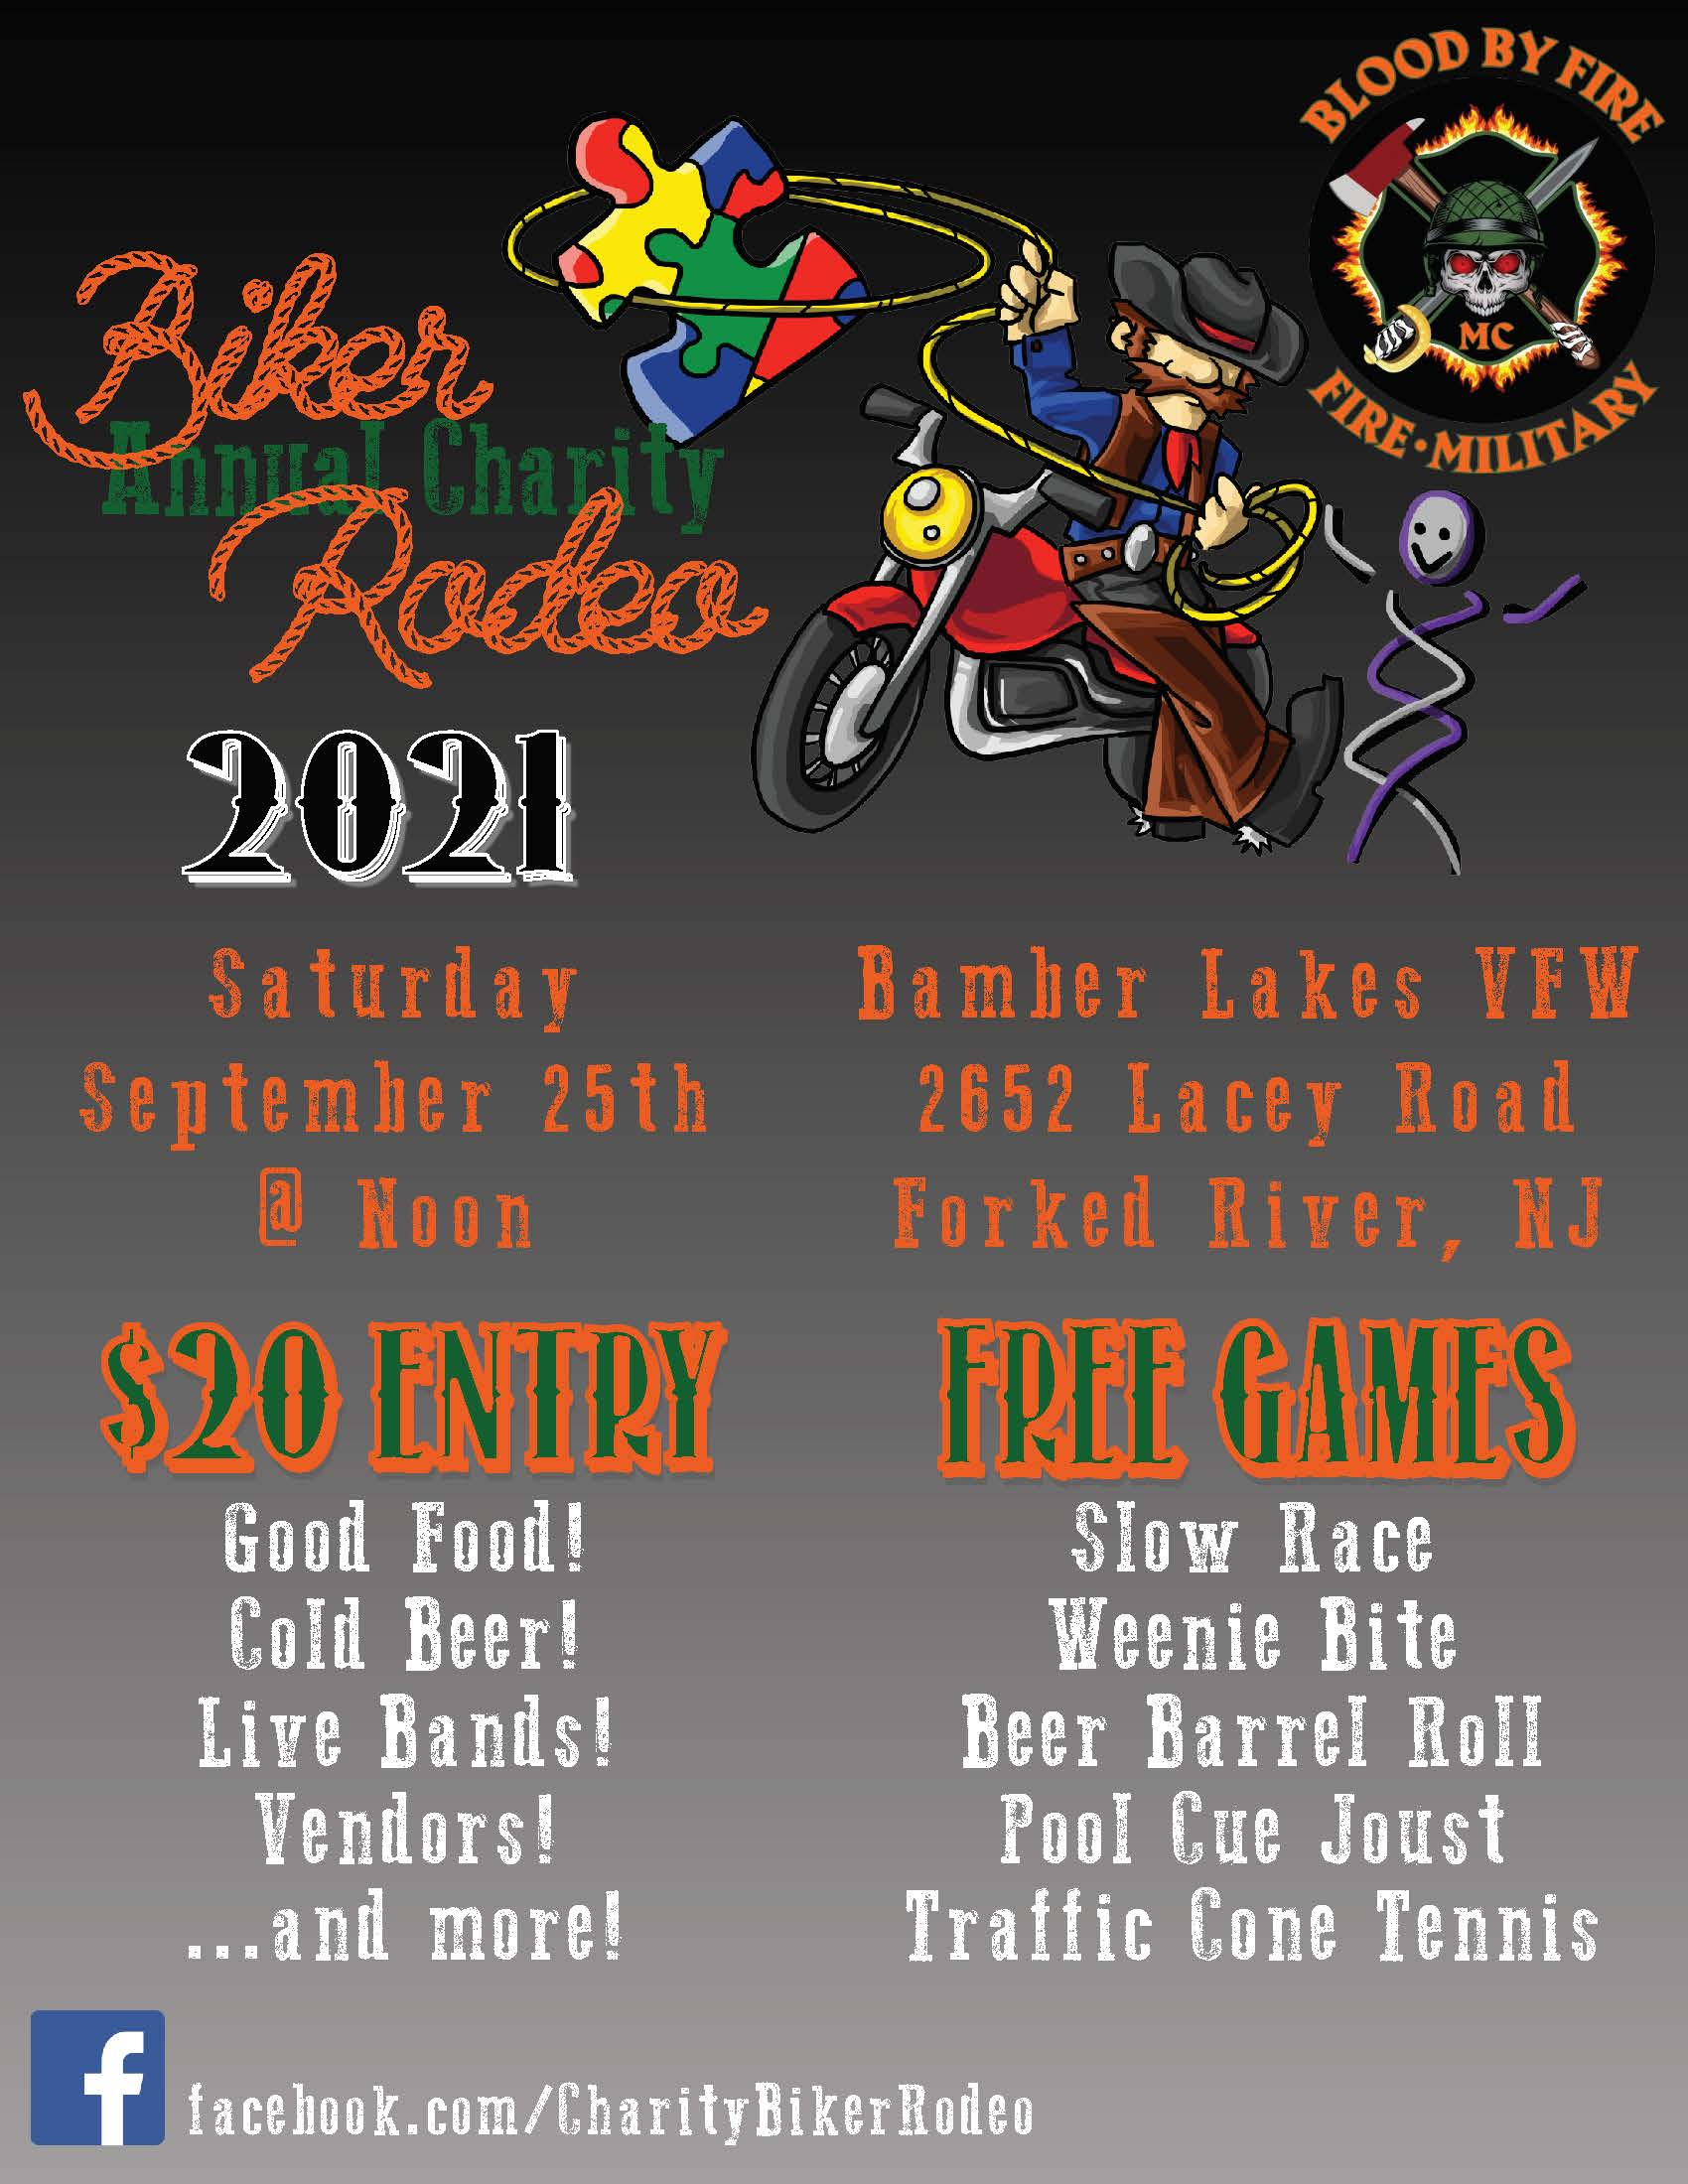 Biker Rodeo 9 25  - Blood by Fire MC Annual Biker Rodeo